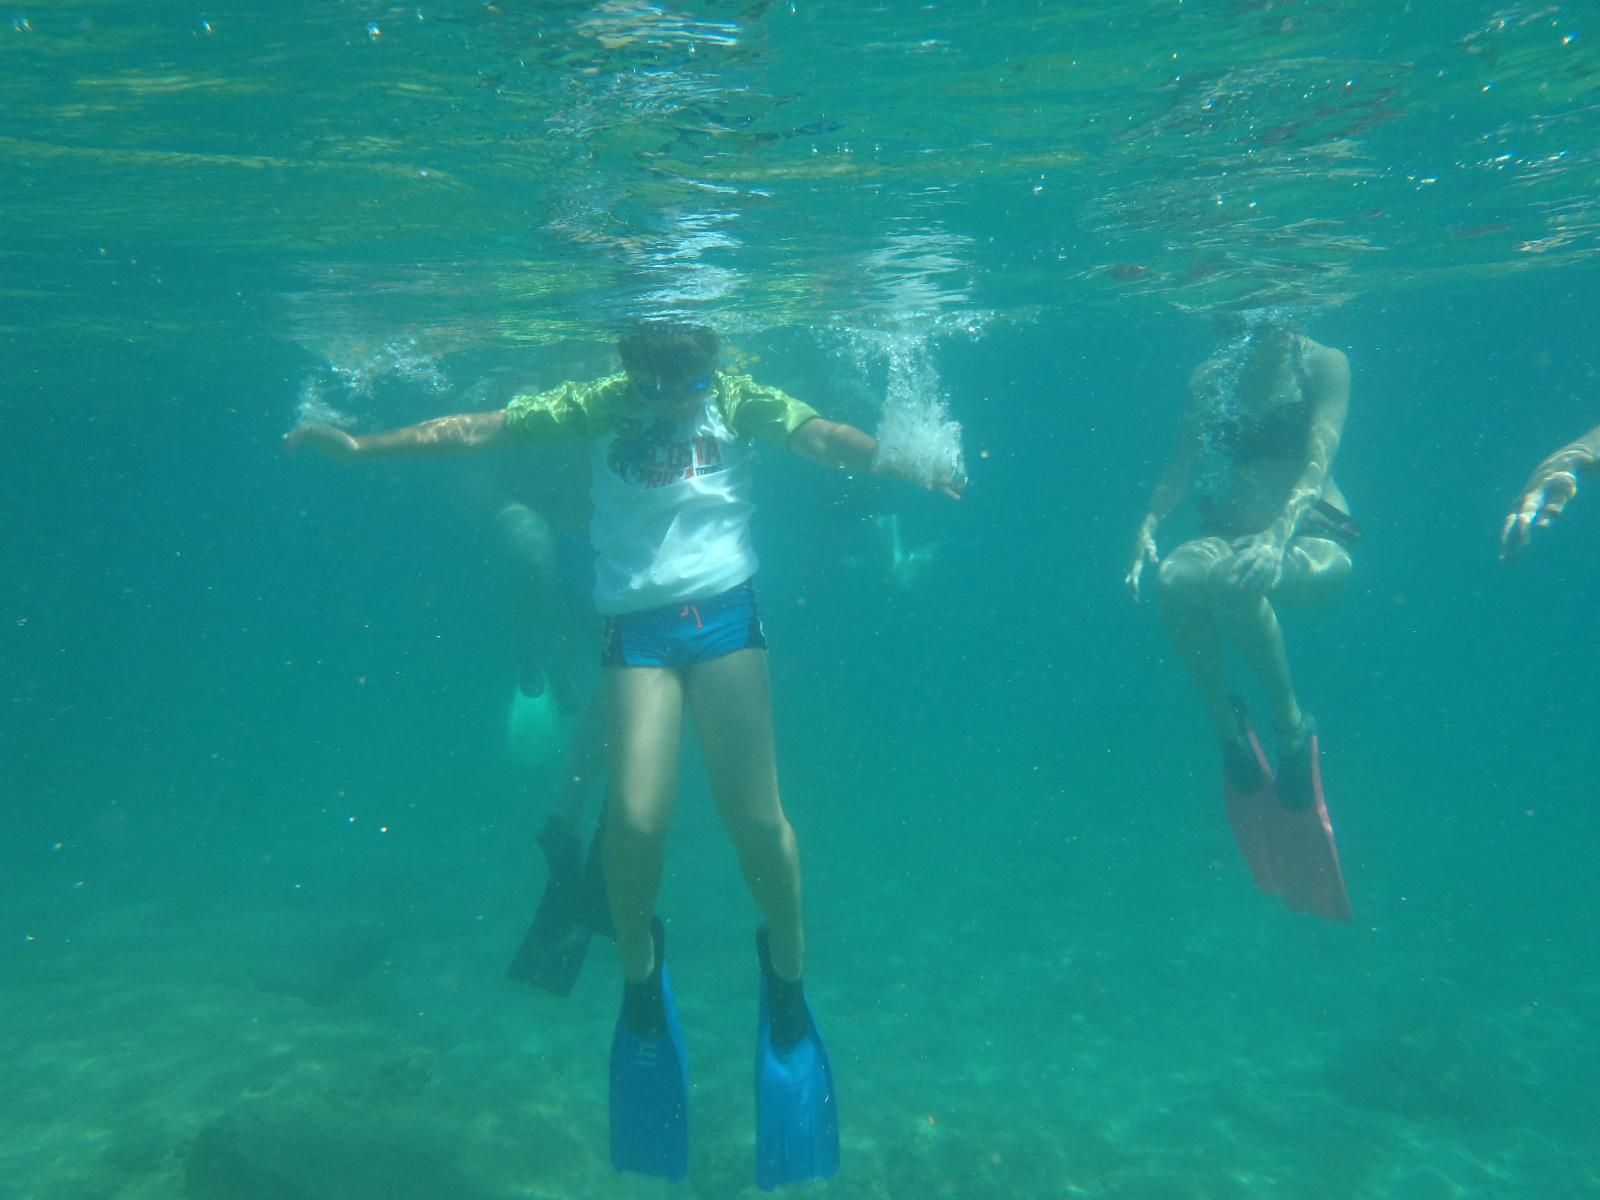 Families underwater snorkeling